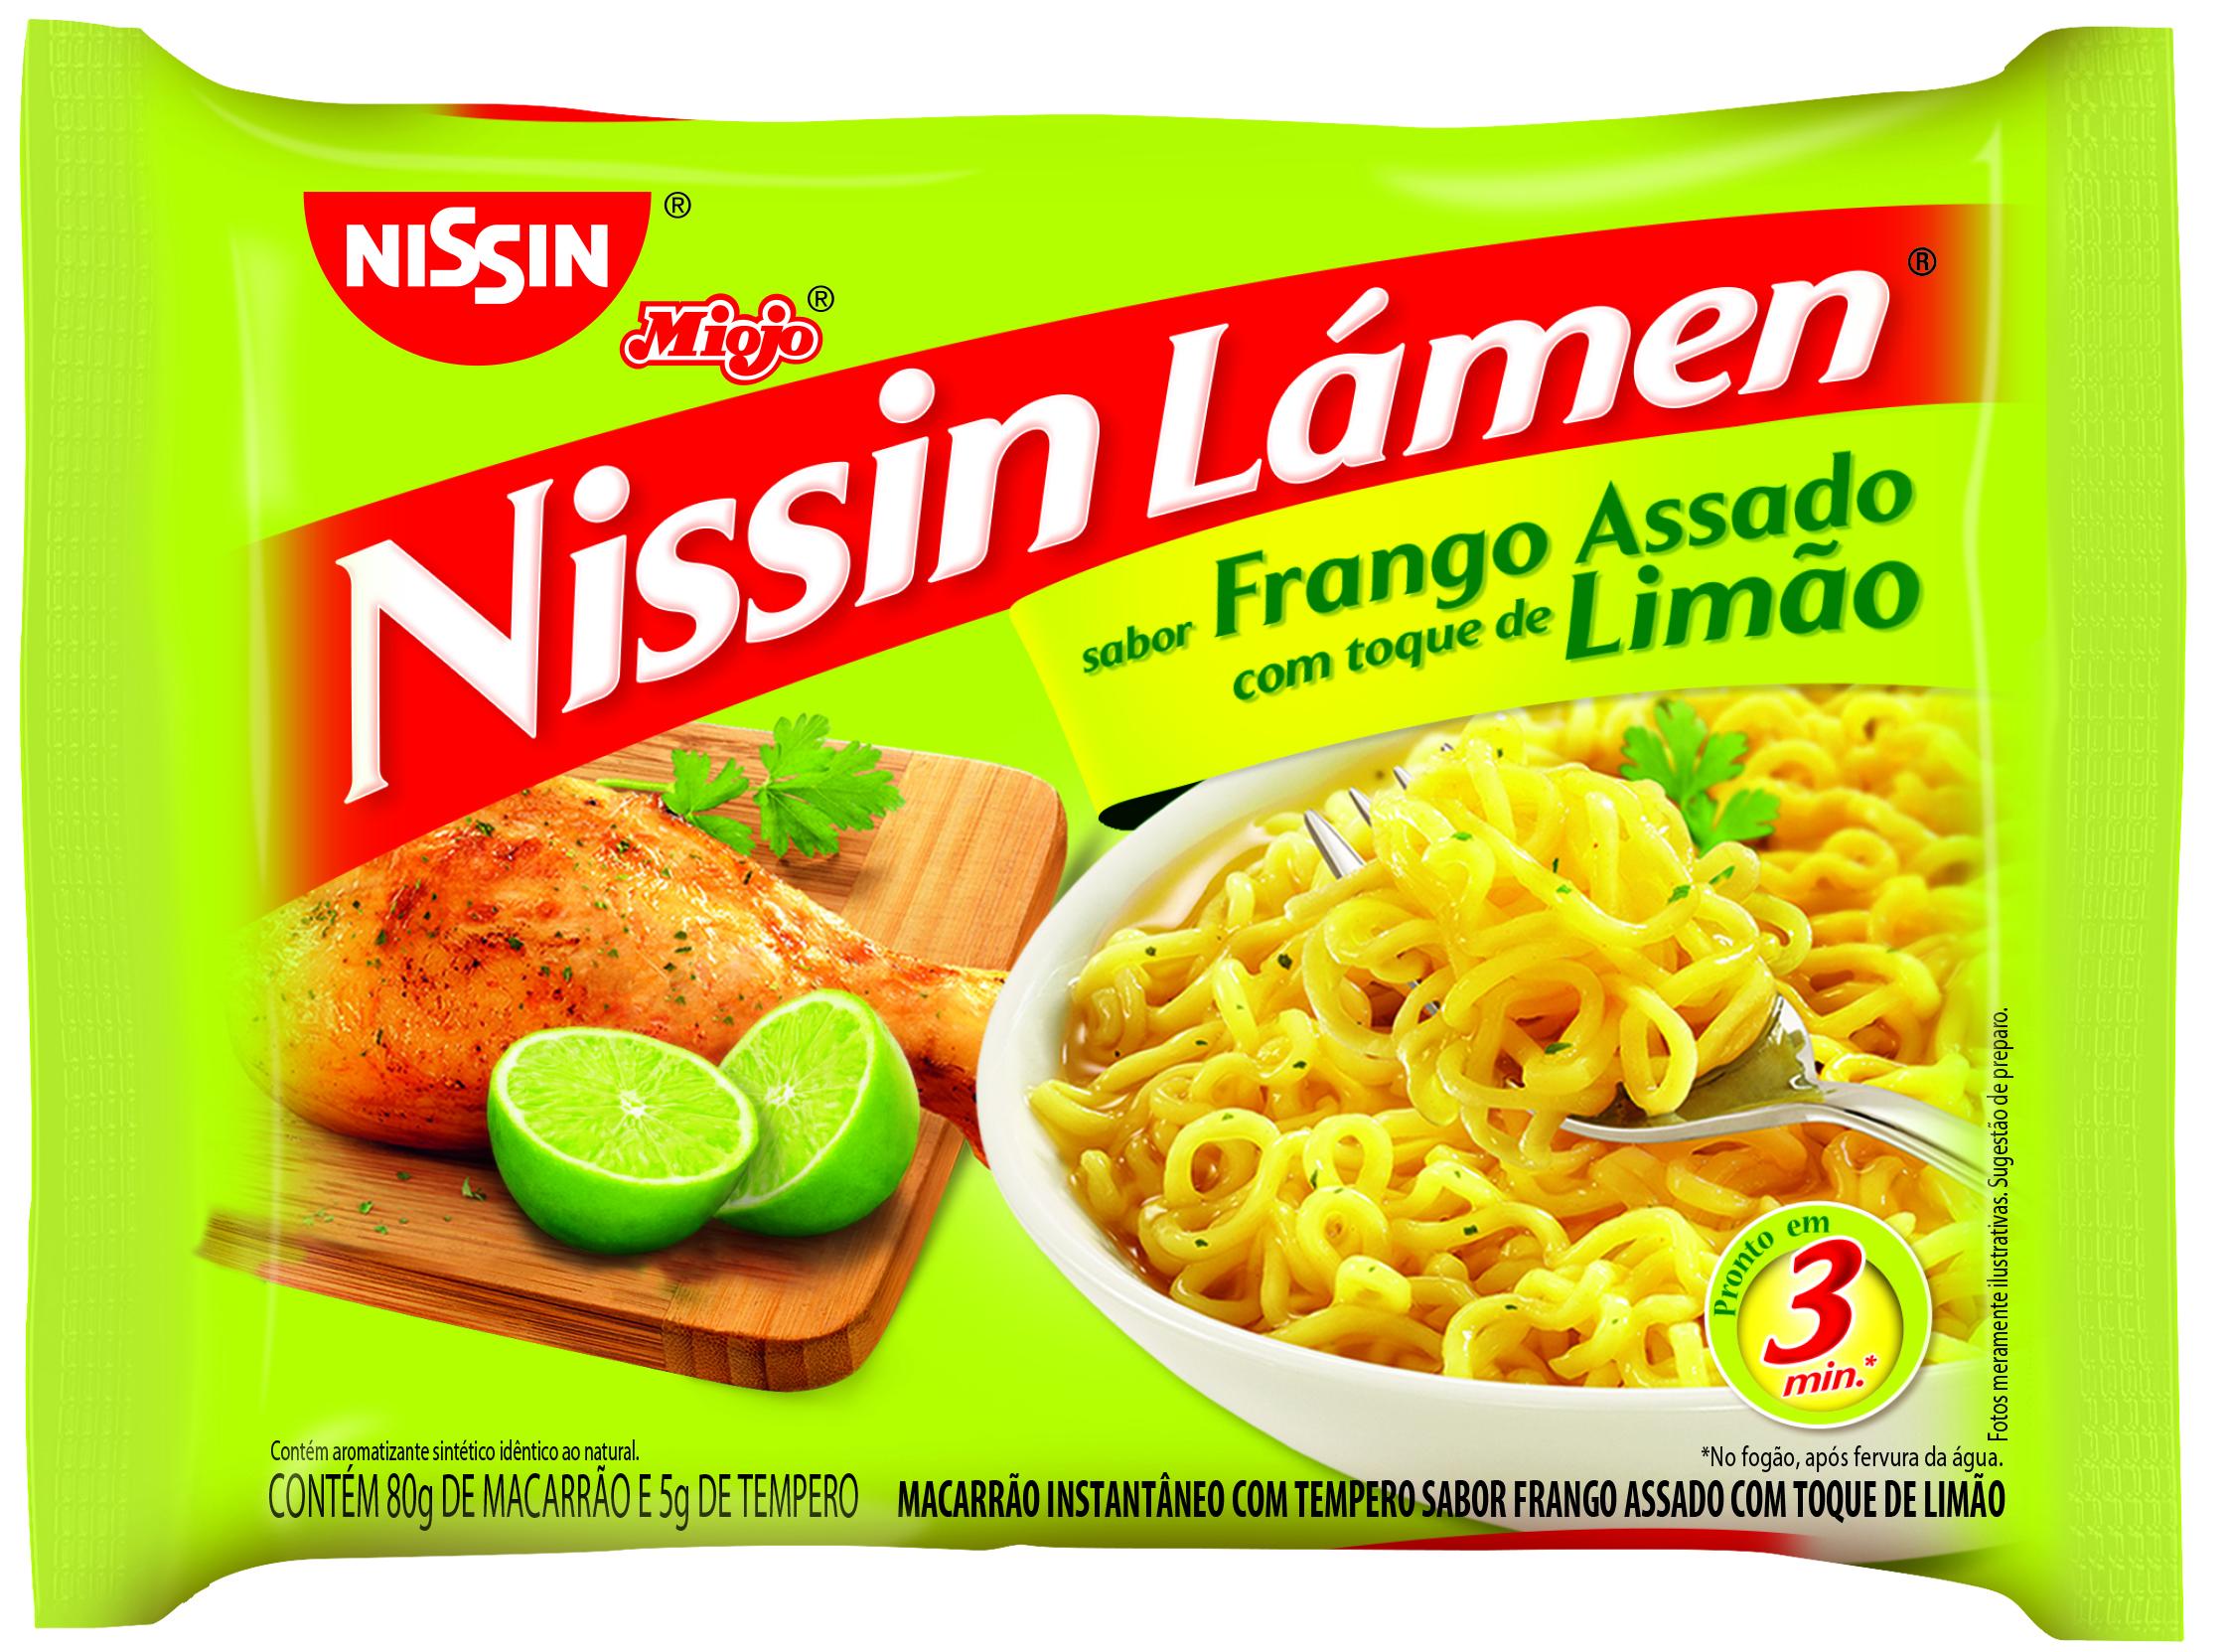 NISSIN LAMEN FRANGO ASS T LIMÃO1X85(50)